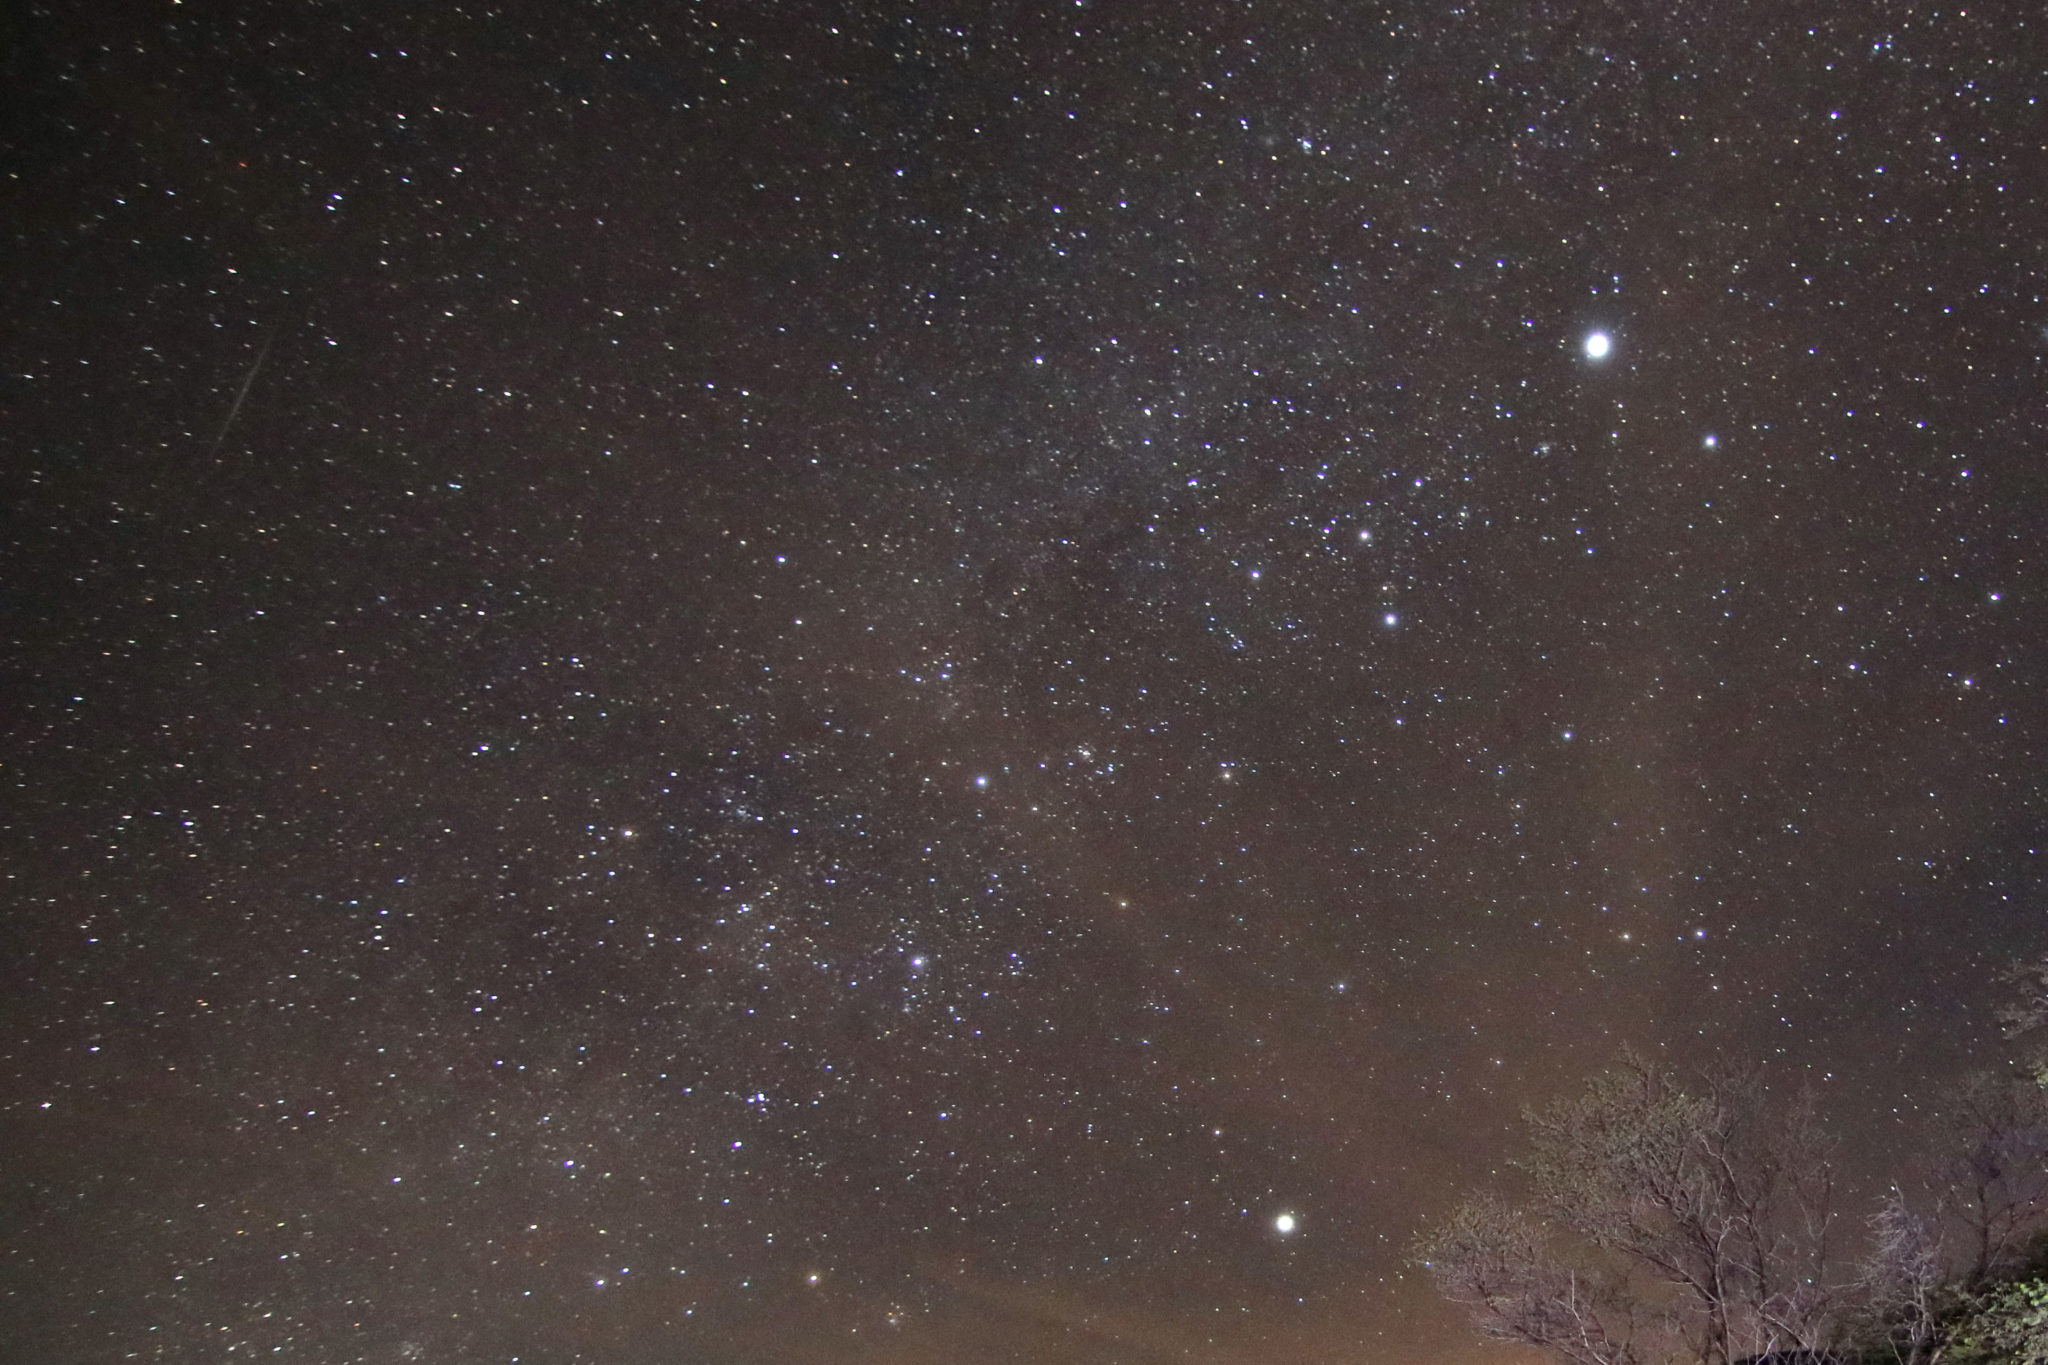 Estrellas, NASA, Telescopio Espacial Hubble, Messier 3,